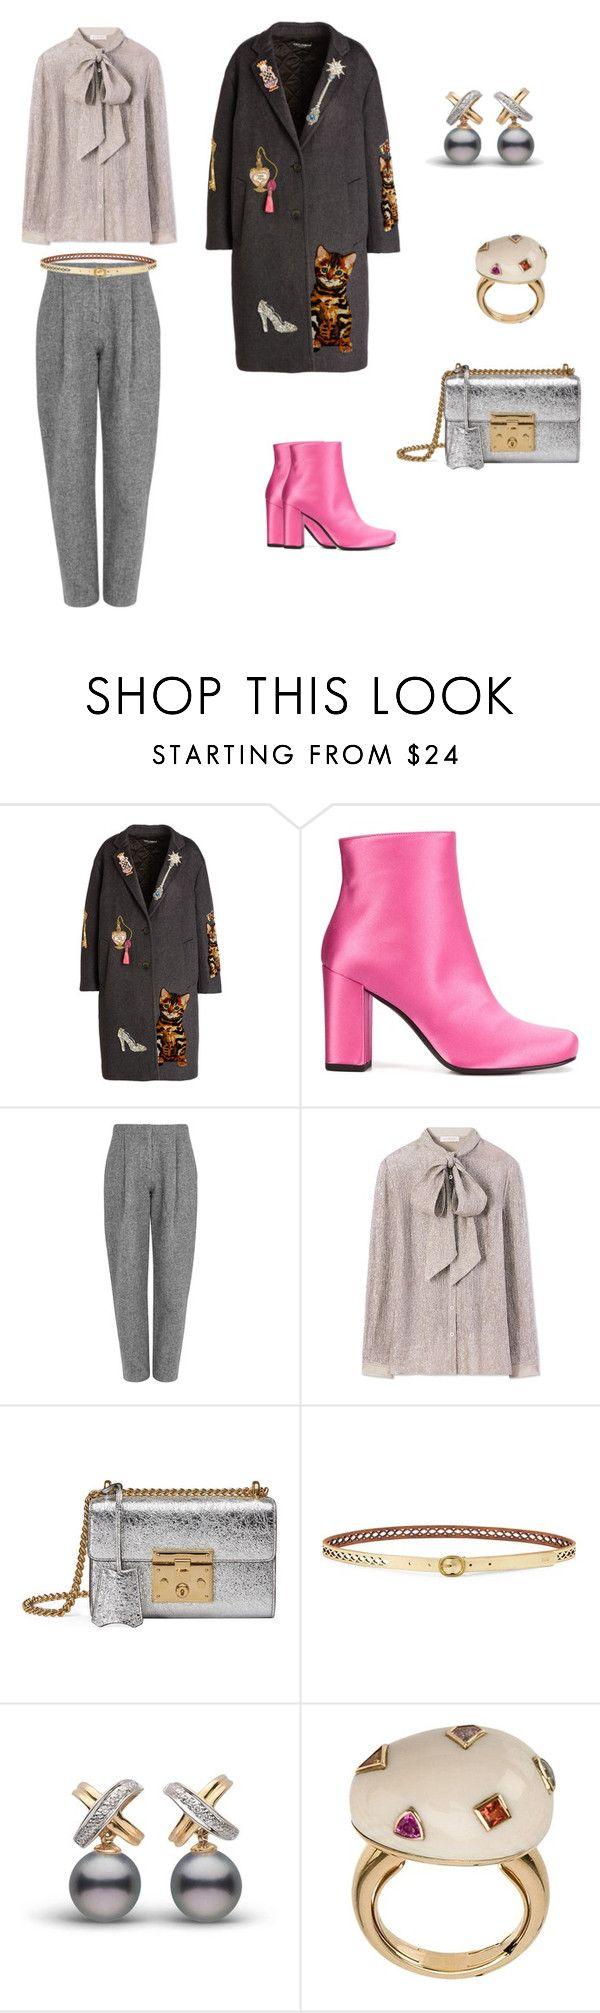 """Set 2"" by natucsya on Polyvore featuring мода, Dolce&Gabbana, Yves Saint Laurent, Acne Studios, Tory Burch, Gucci, Lauren Ralph Lauren и BIBI VAN DER VELDEN"